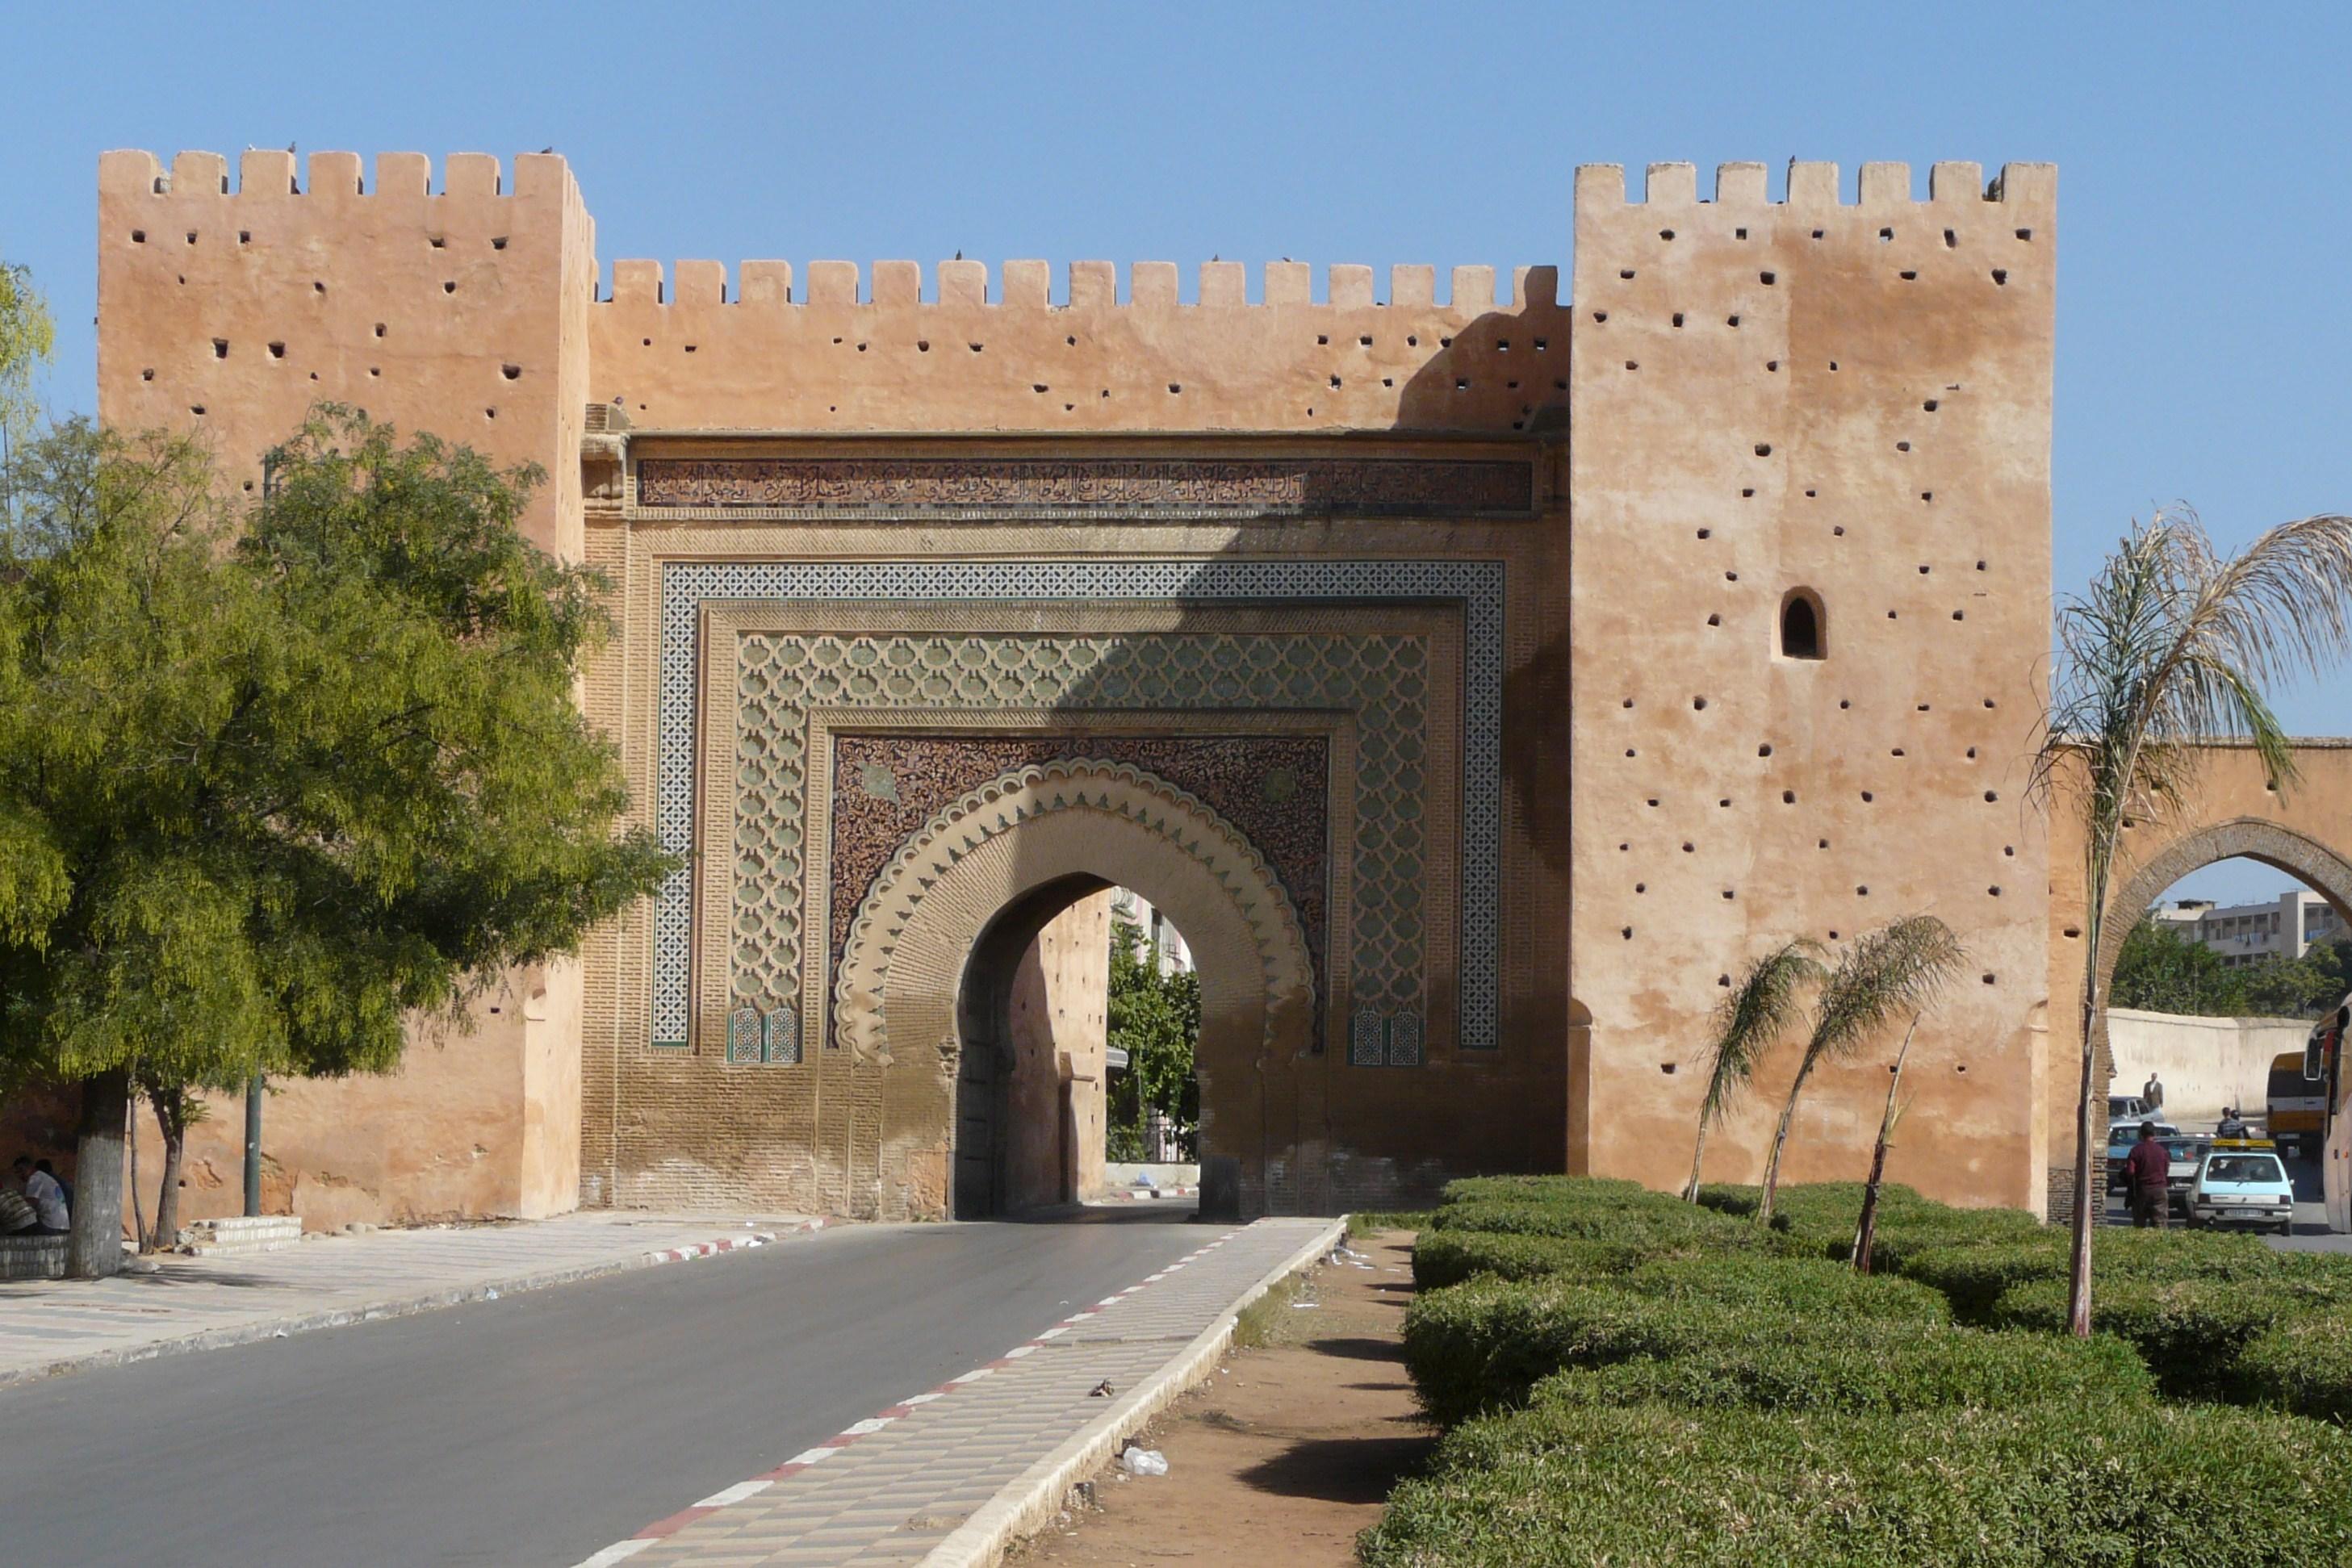 Meknes Bab el-Khemis